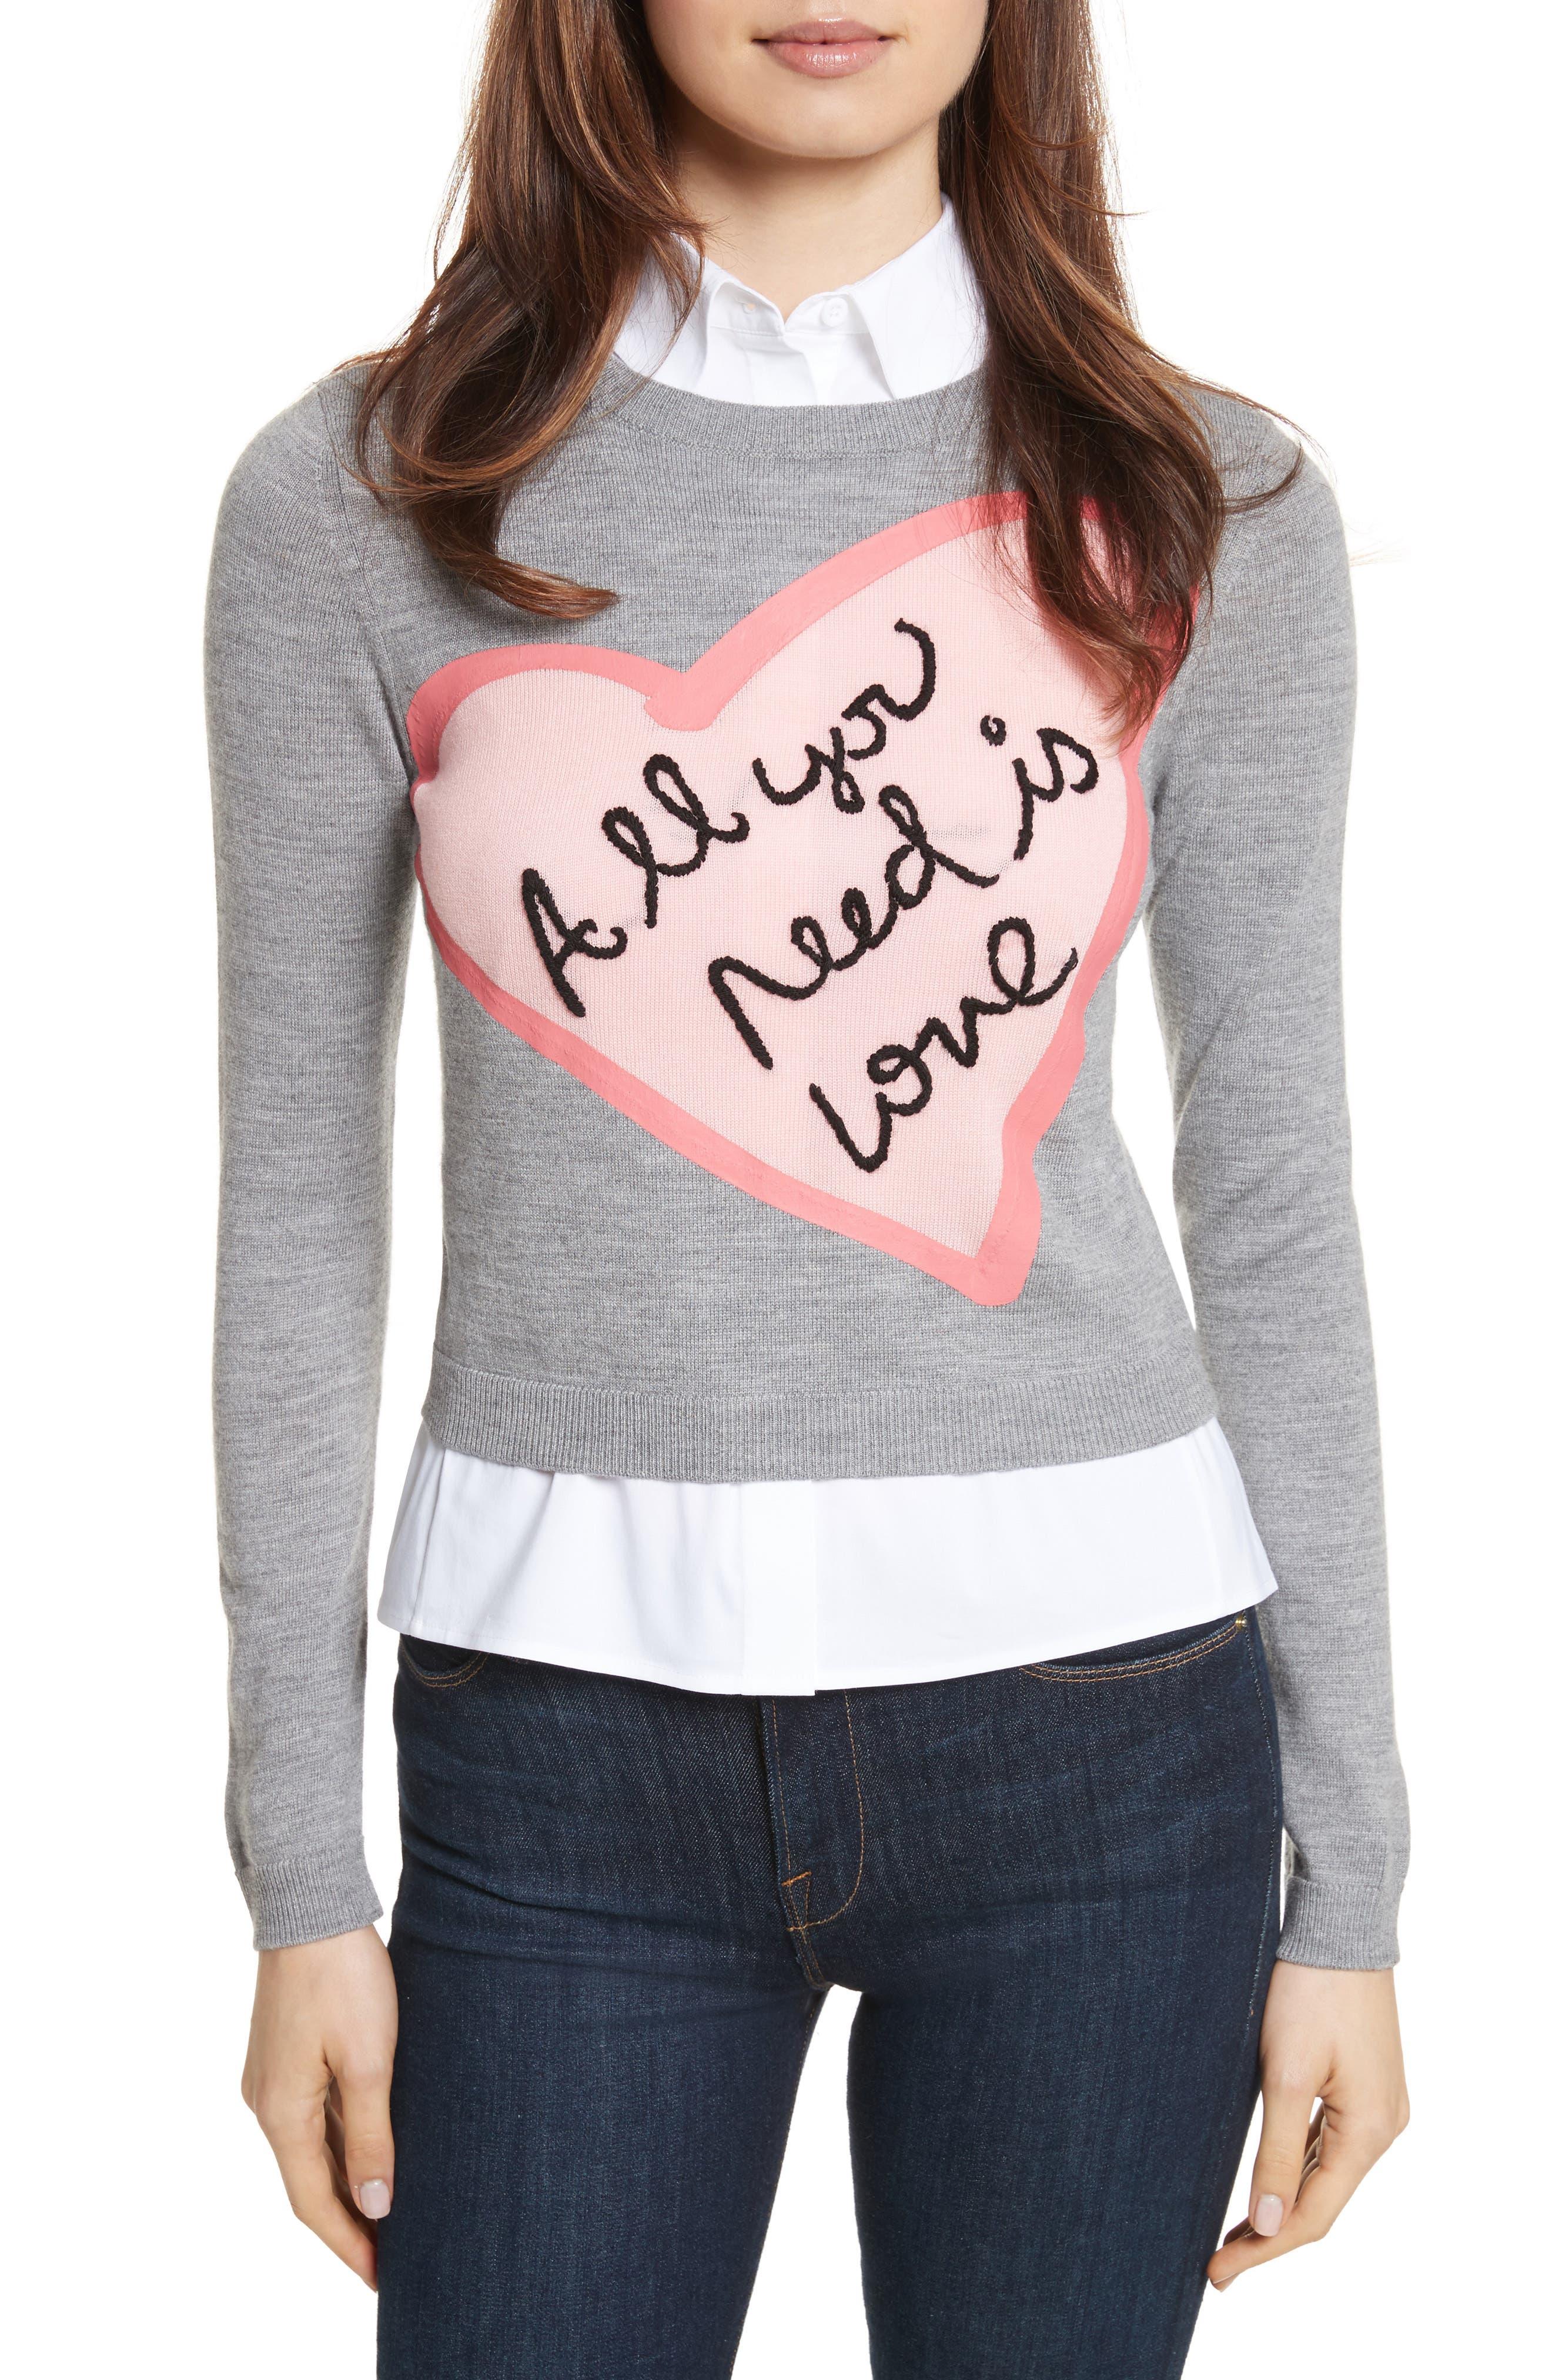 Main Image - Alice + Olivia AO x The Beatles Nikia All You Need is Love Pullover